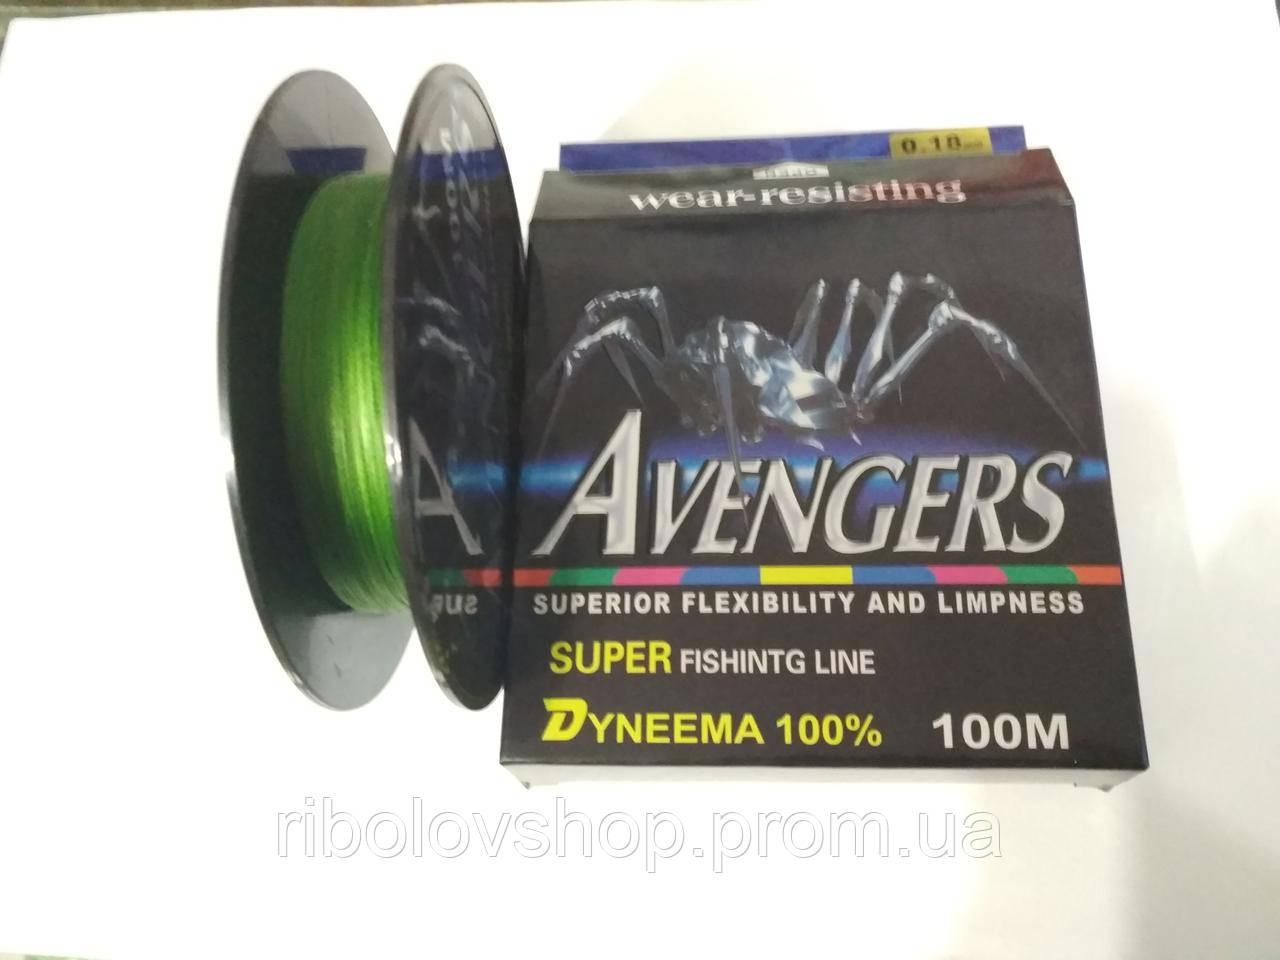 Avengers 100m